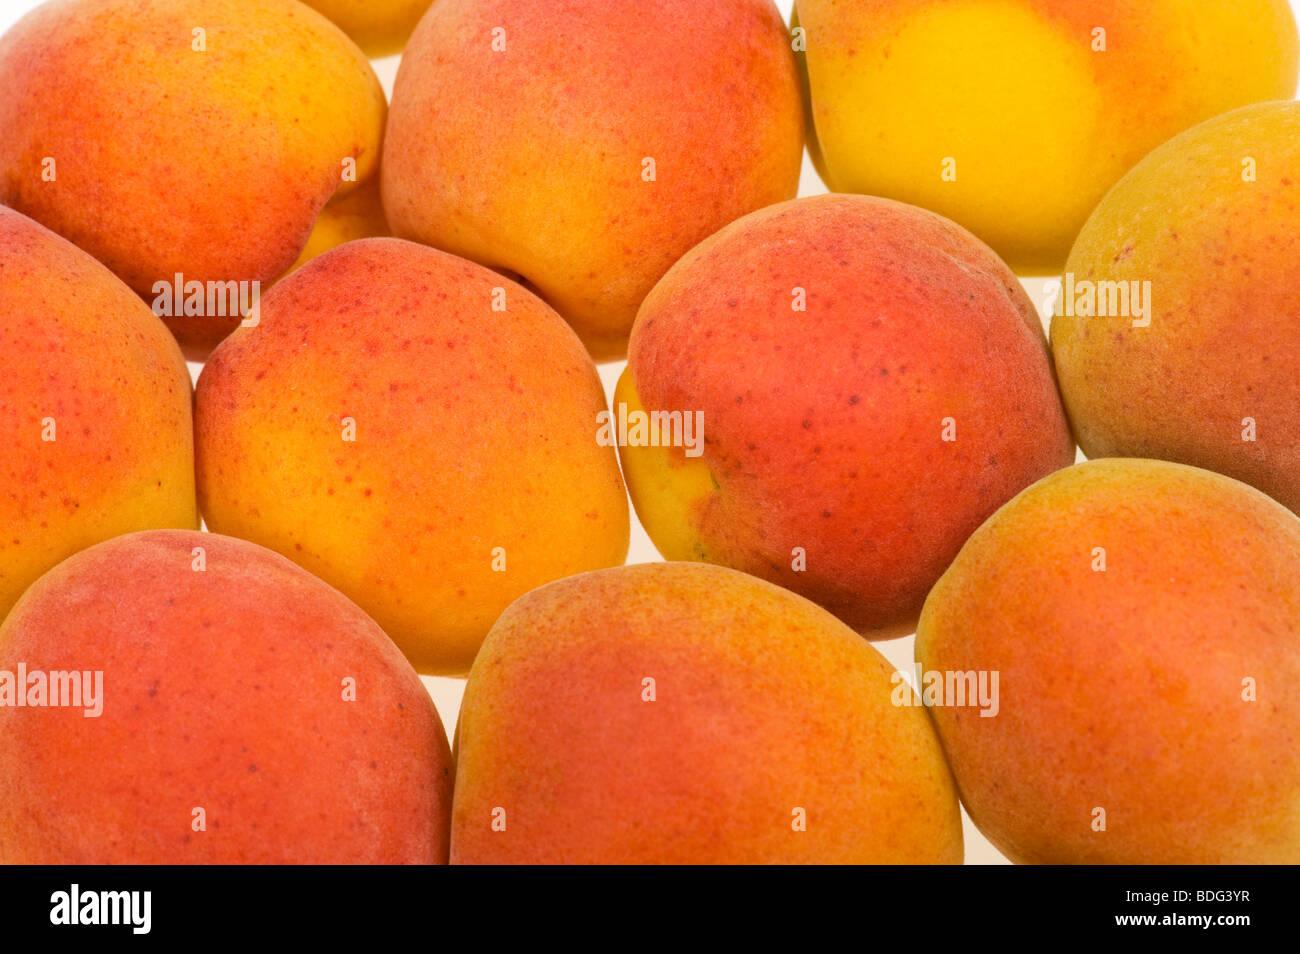 fresh french APRICOT cutout white background studio shot FOOD fruit sweet fresh orange red yellow just pur many - Stock Image